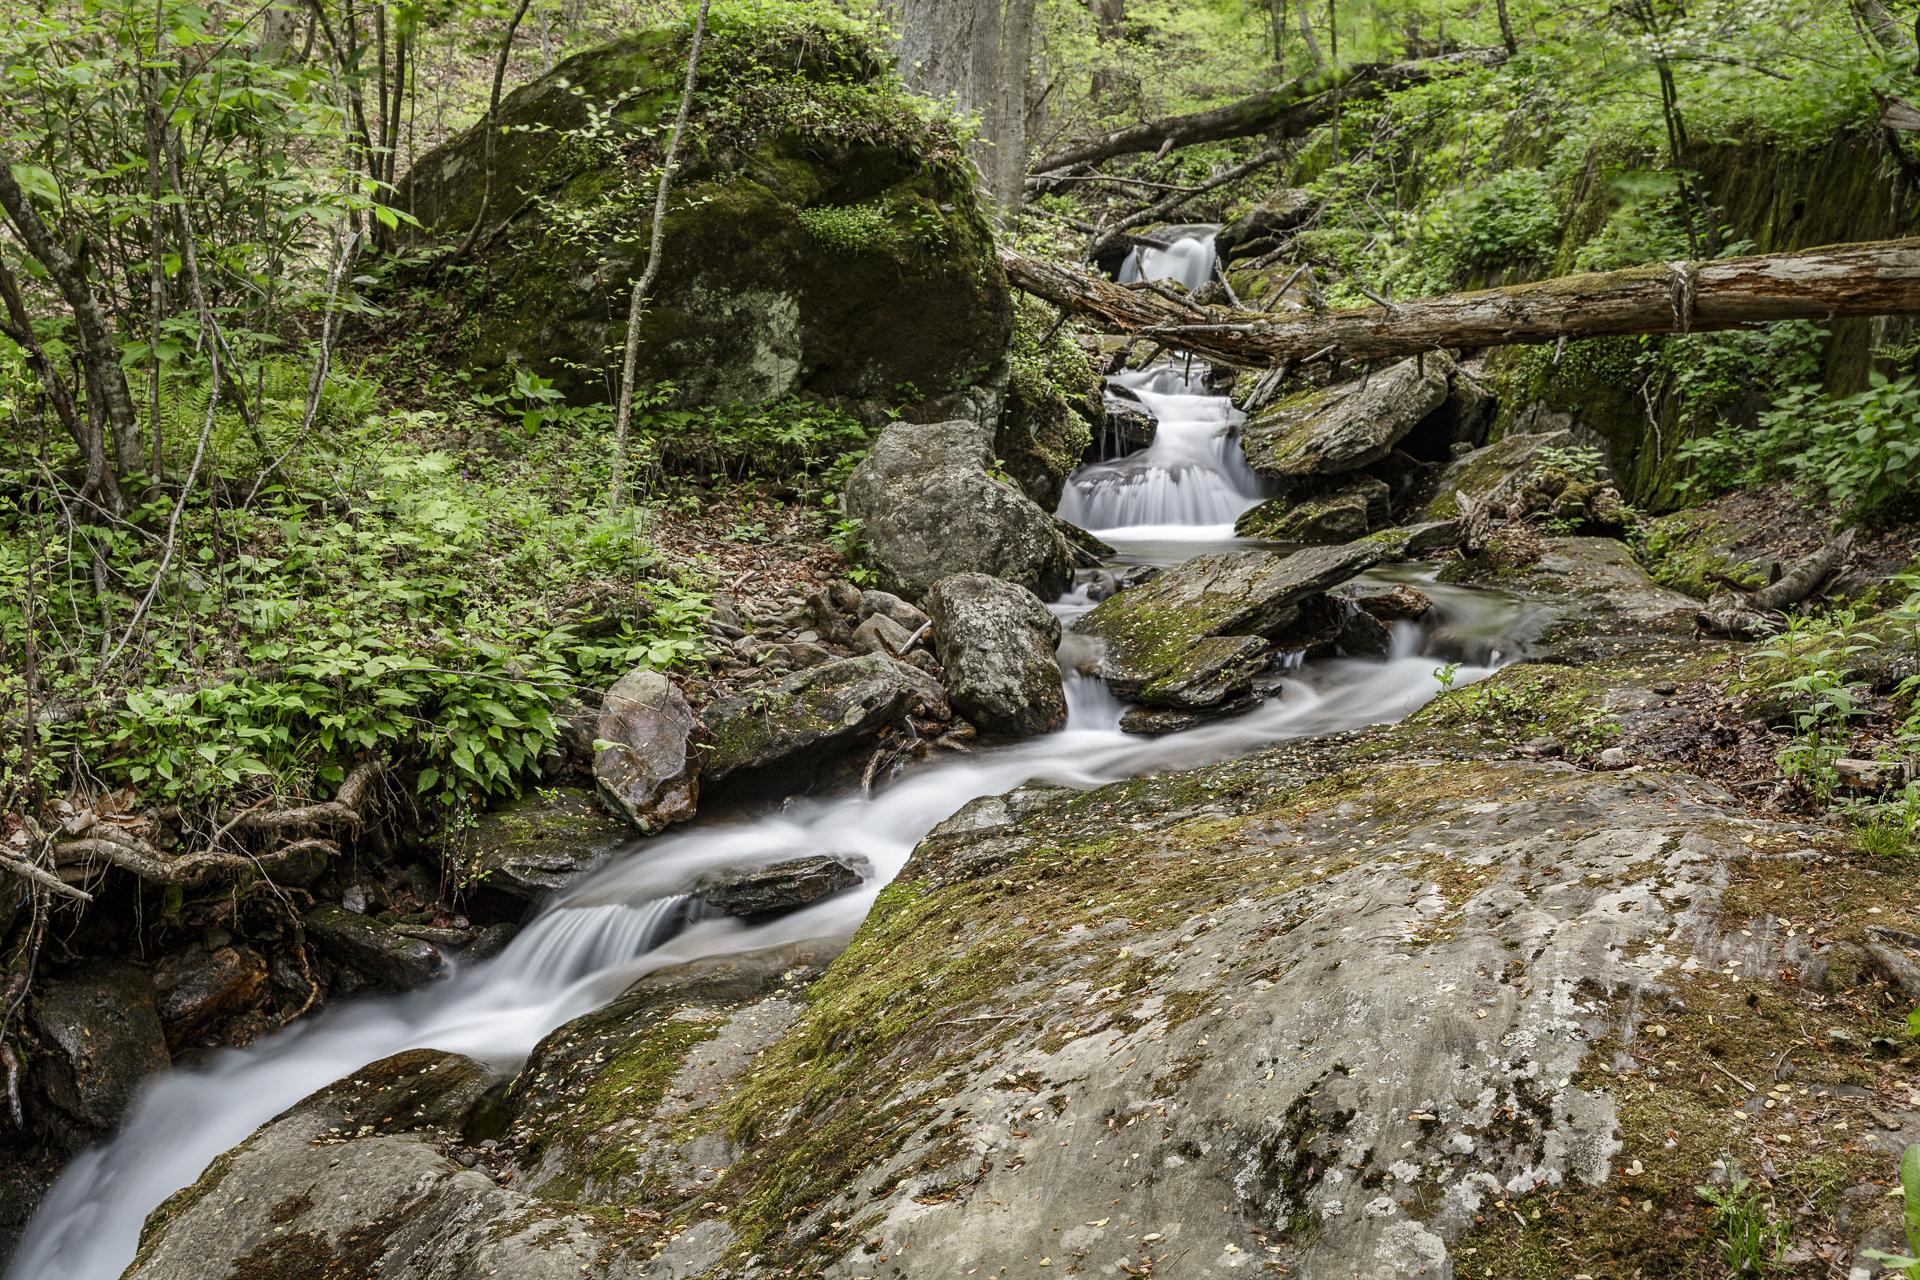 walker-falls-in-the-pisgah-national-forest-Kathleen-Kathy-Roberts-Asheville-NC-Photographer-1.jpg